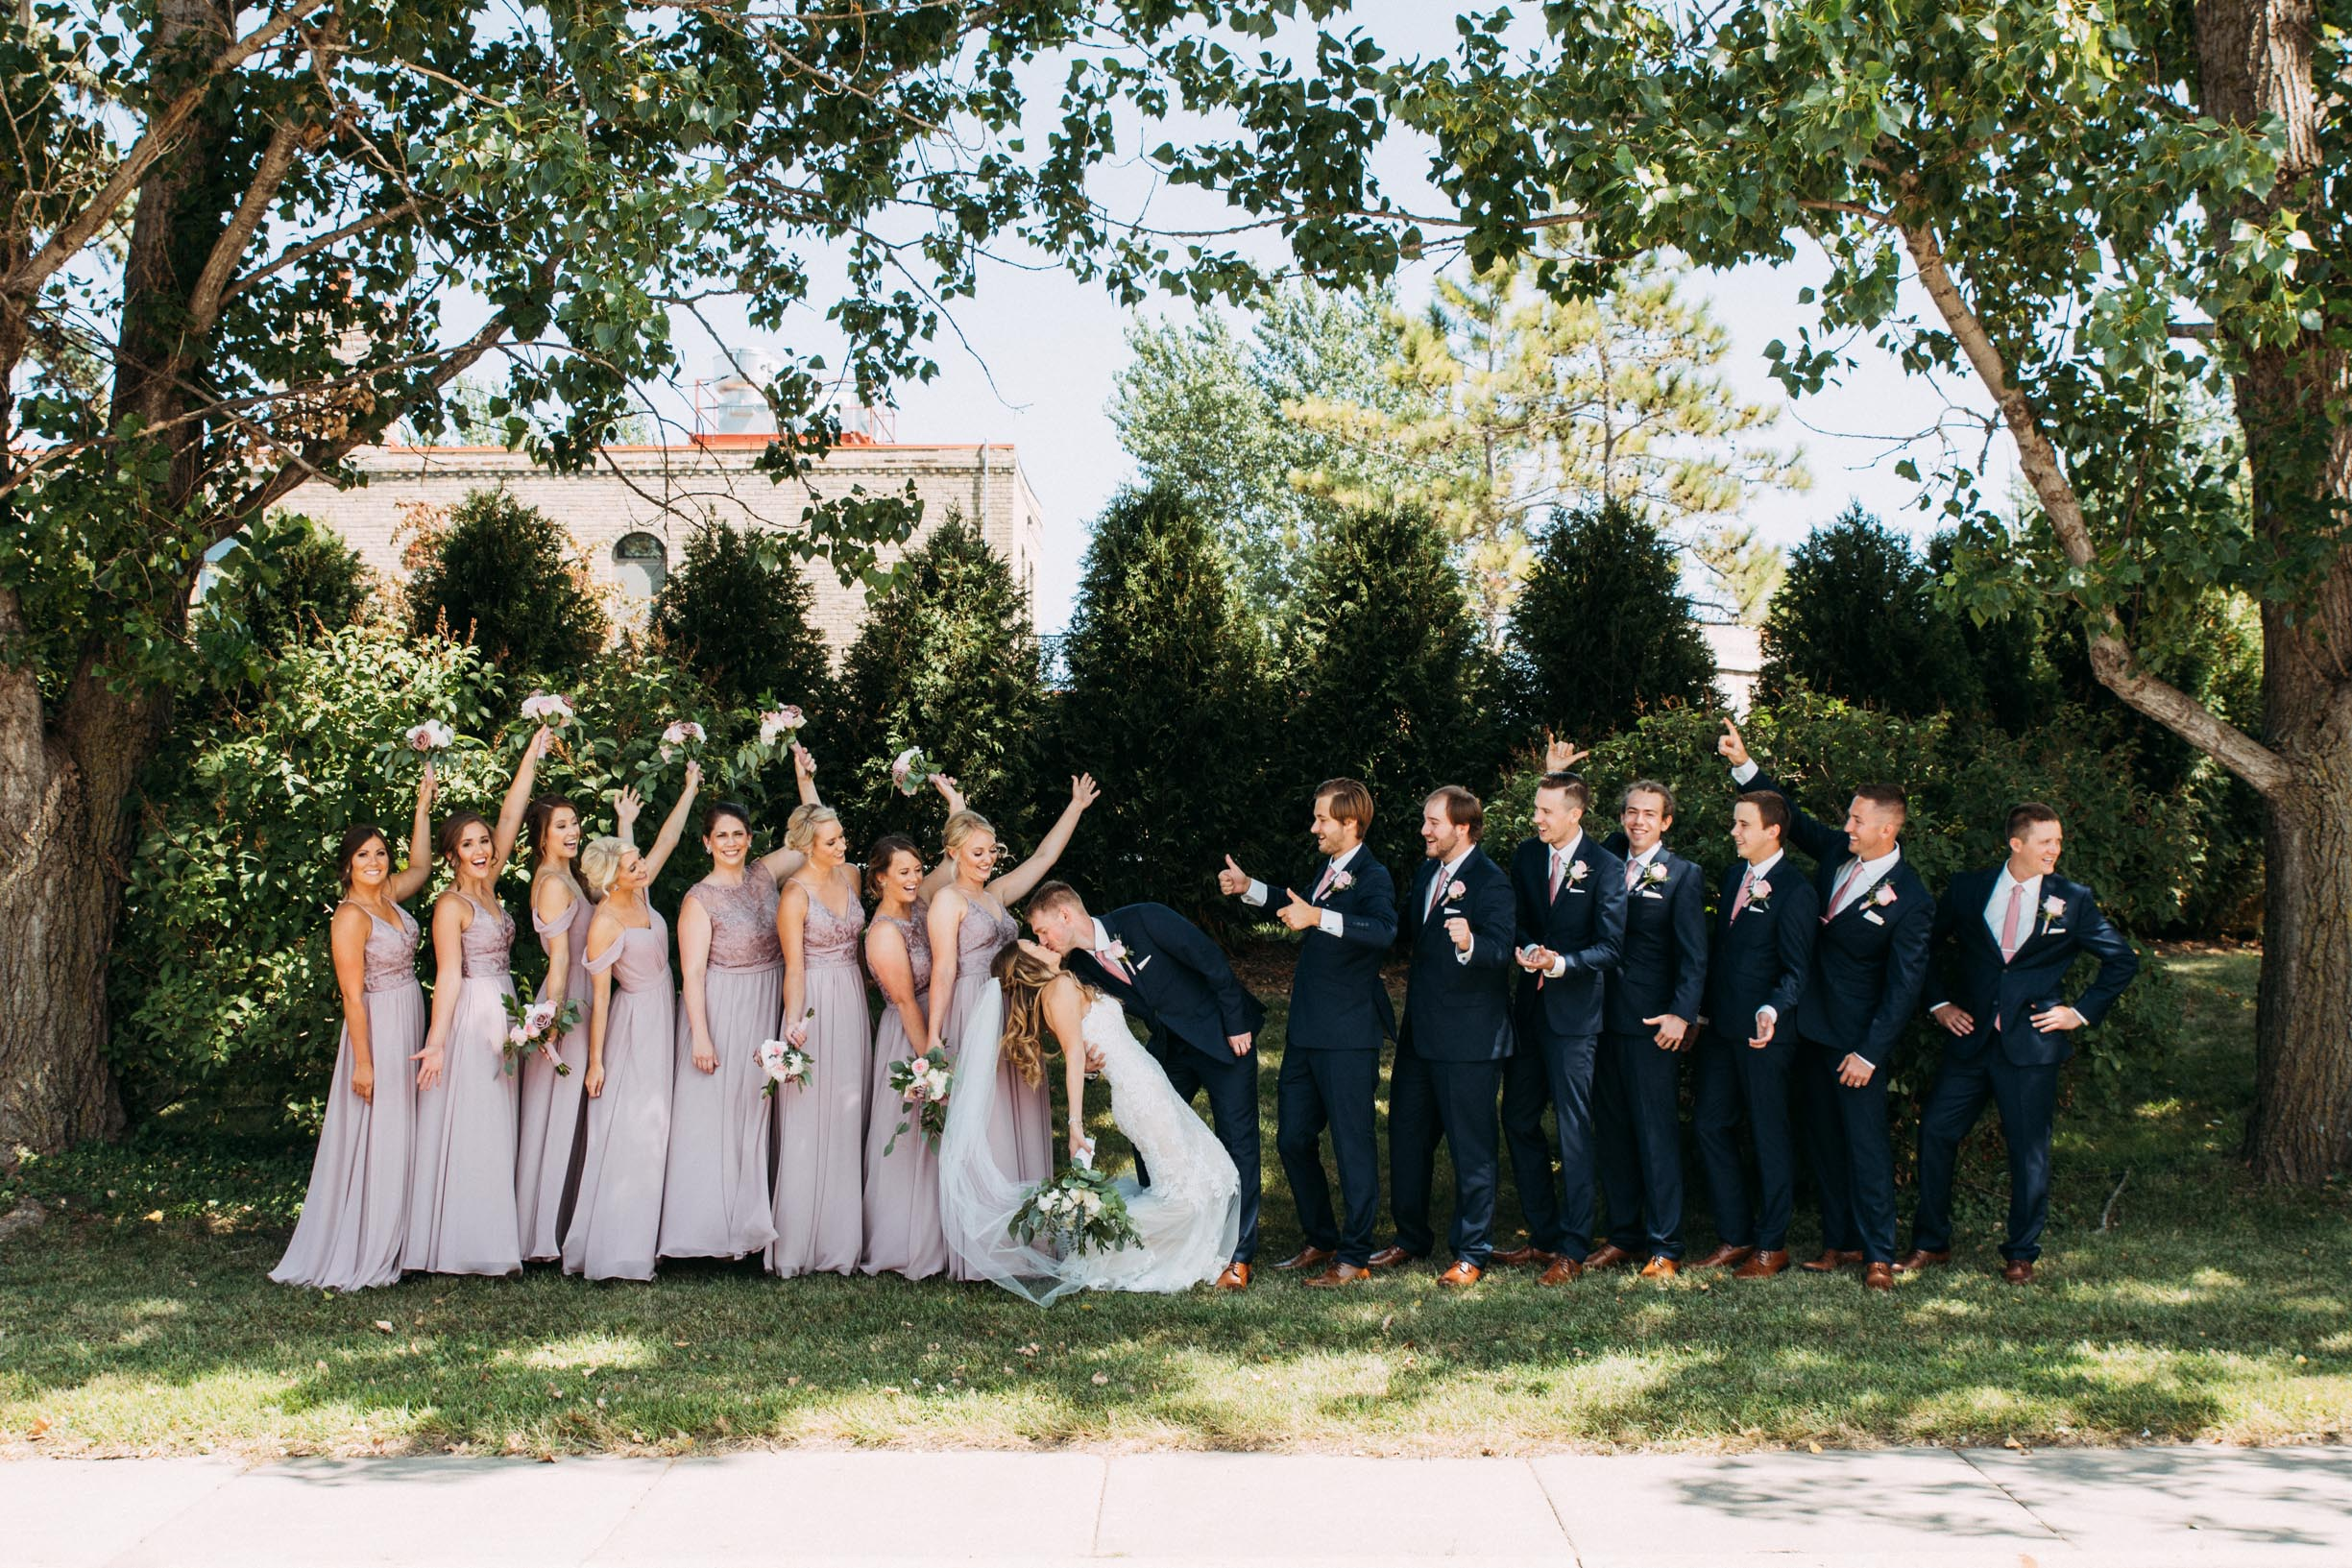 26-WeddingsattheBroz_Minnesota_WeddingBlog_WeddingParty.jpg